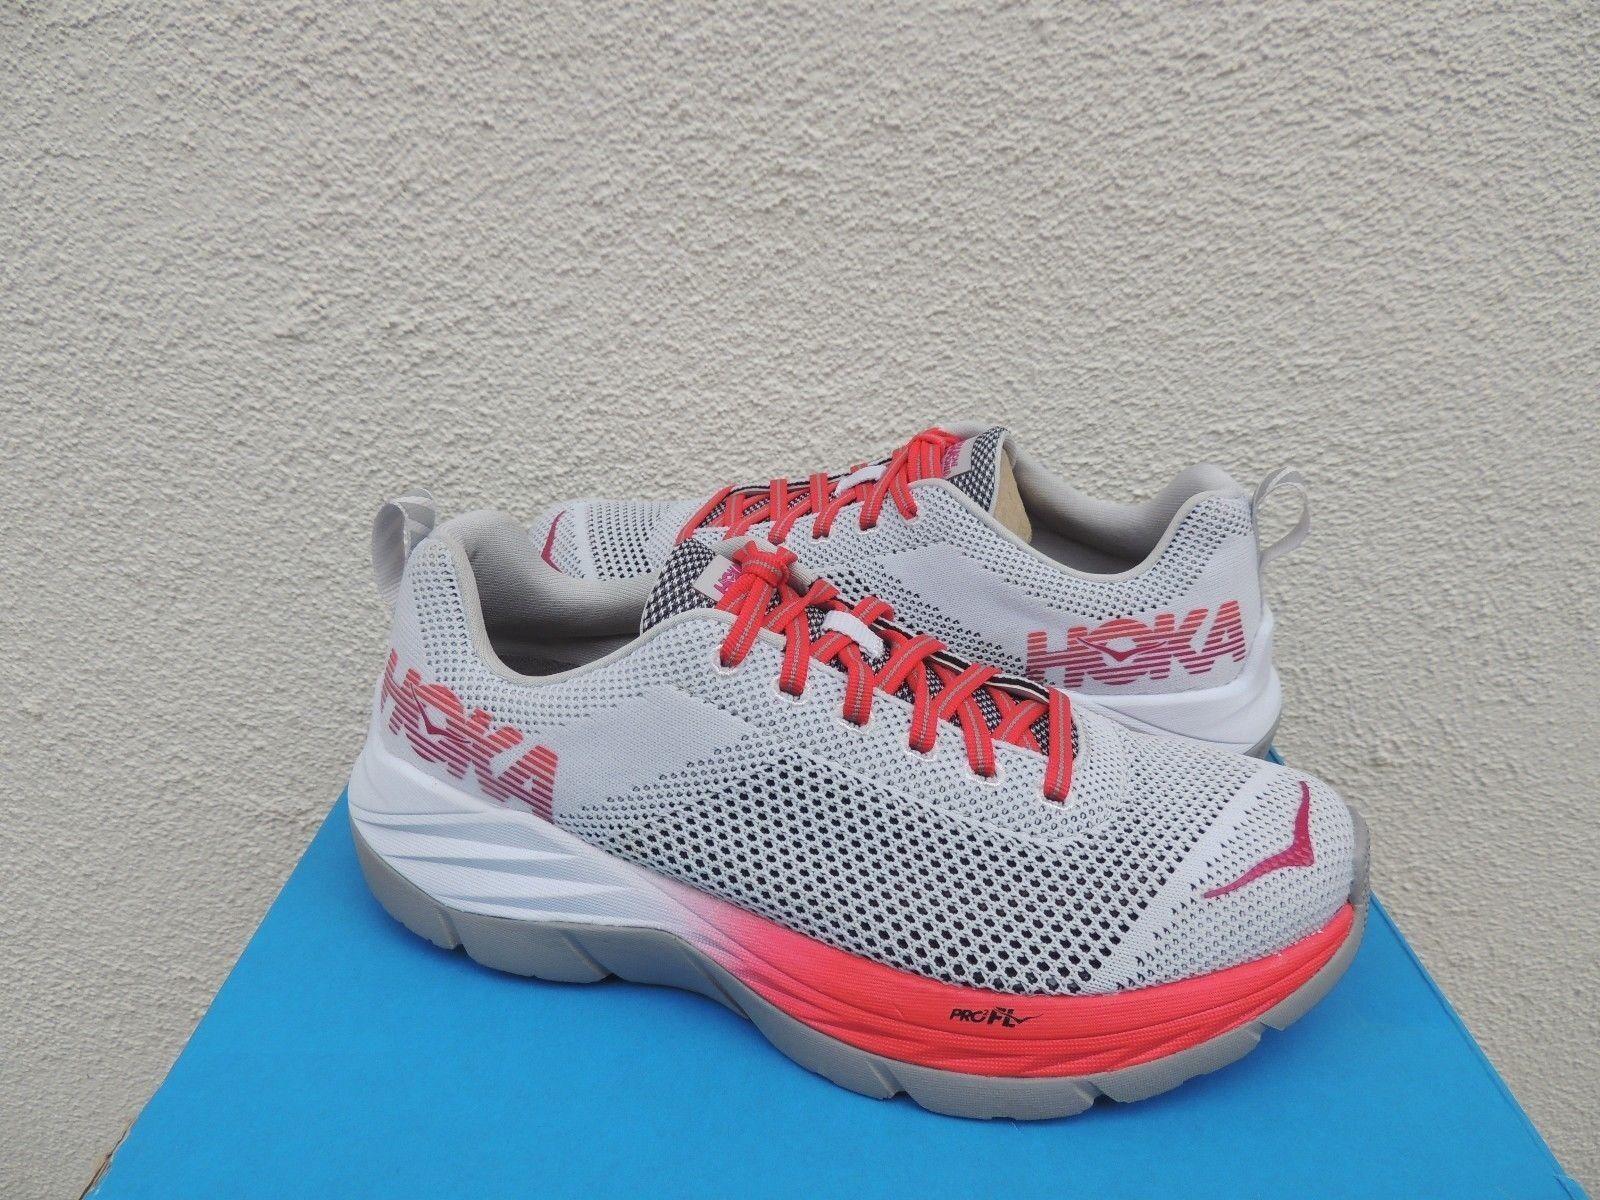 HOKA ONE ONE MACH Weiß/ HIBISCUS RUNNING Schuhe, Damens US NEW 7/ EUR 38 2/3 NEW US 417069